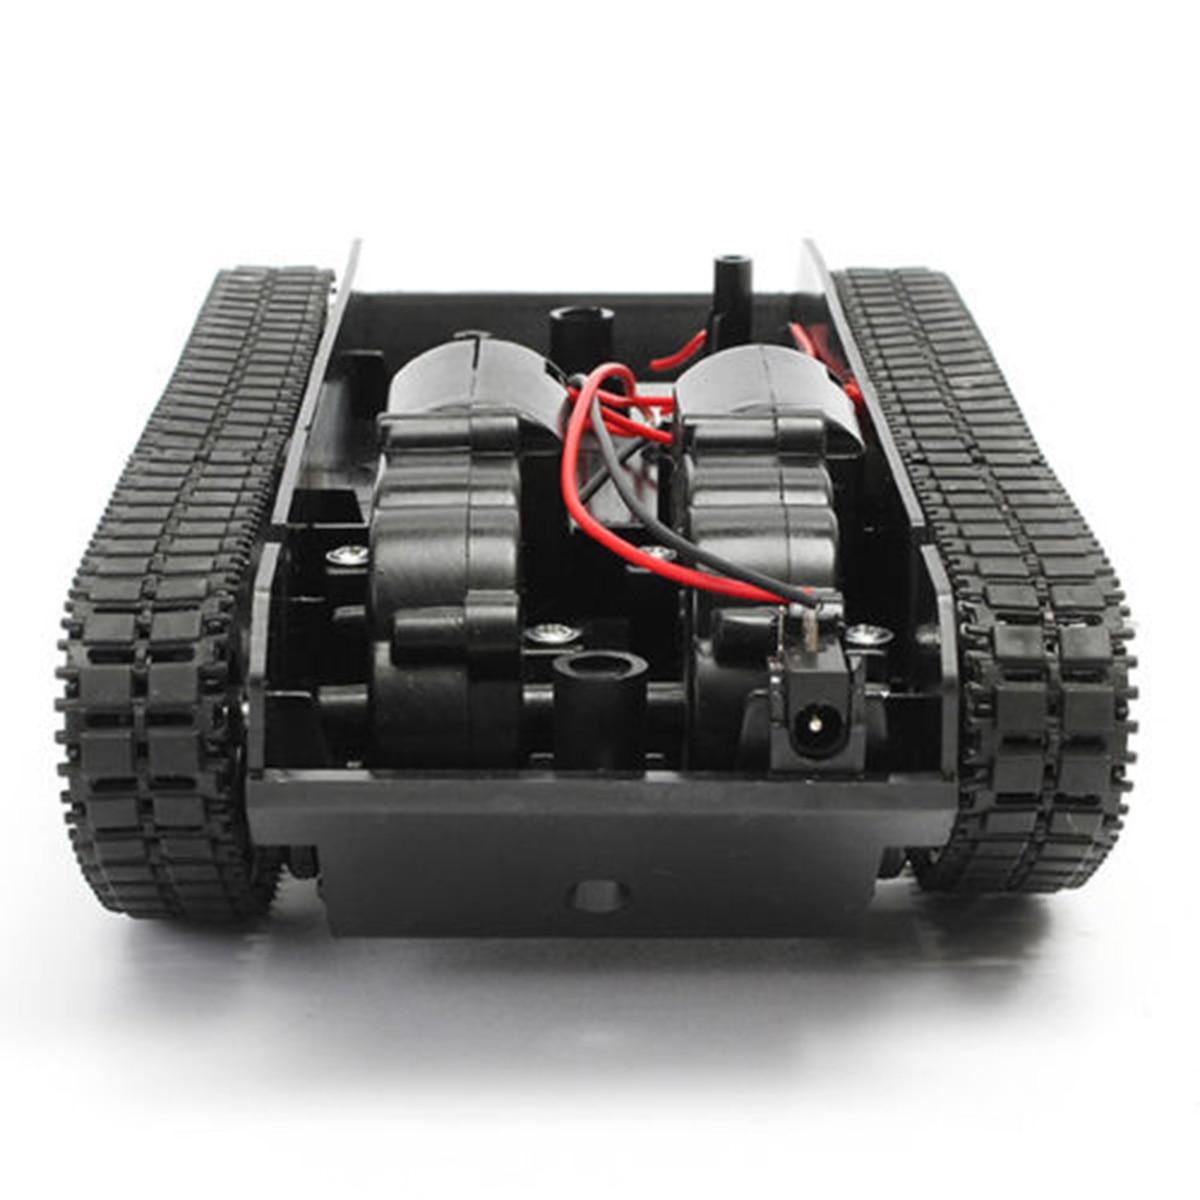 Robot Tank Smart Robot Tank Car Chassis Kit Rubber Track Crawler For Ar dui no 130 Motor Diy Robot T